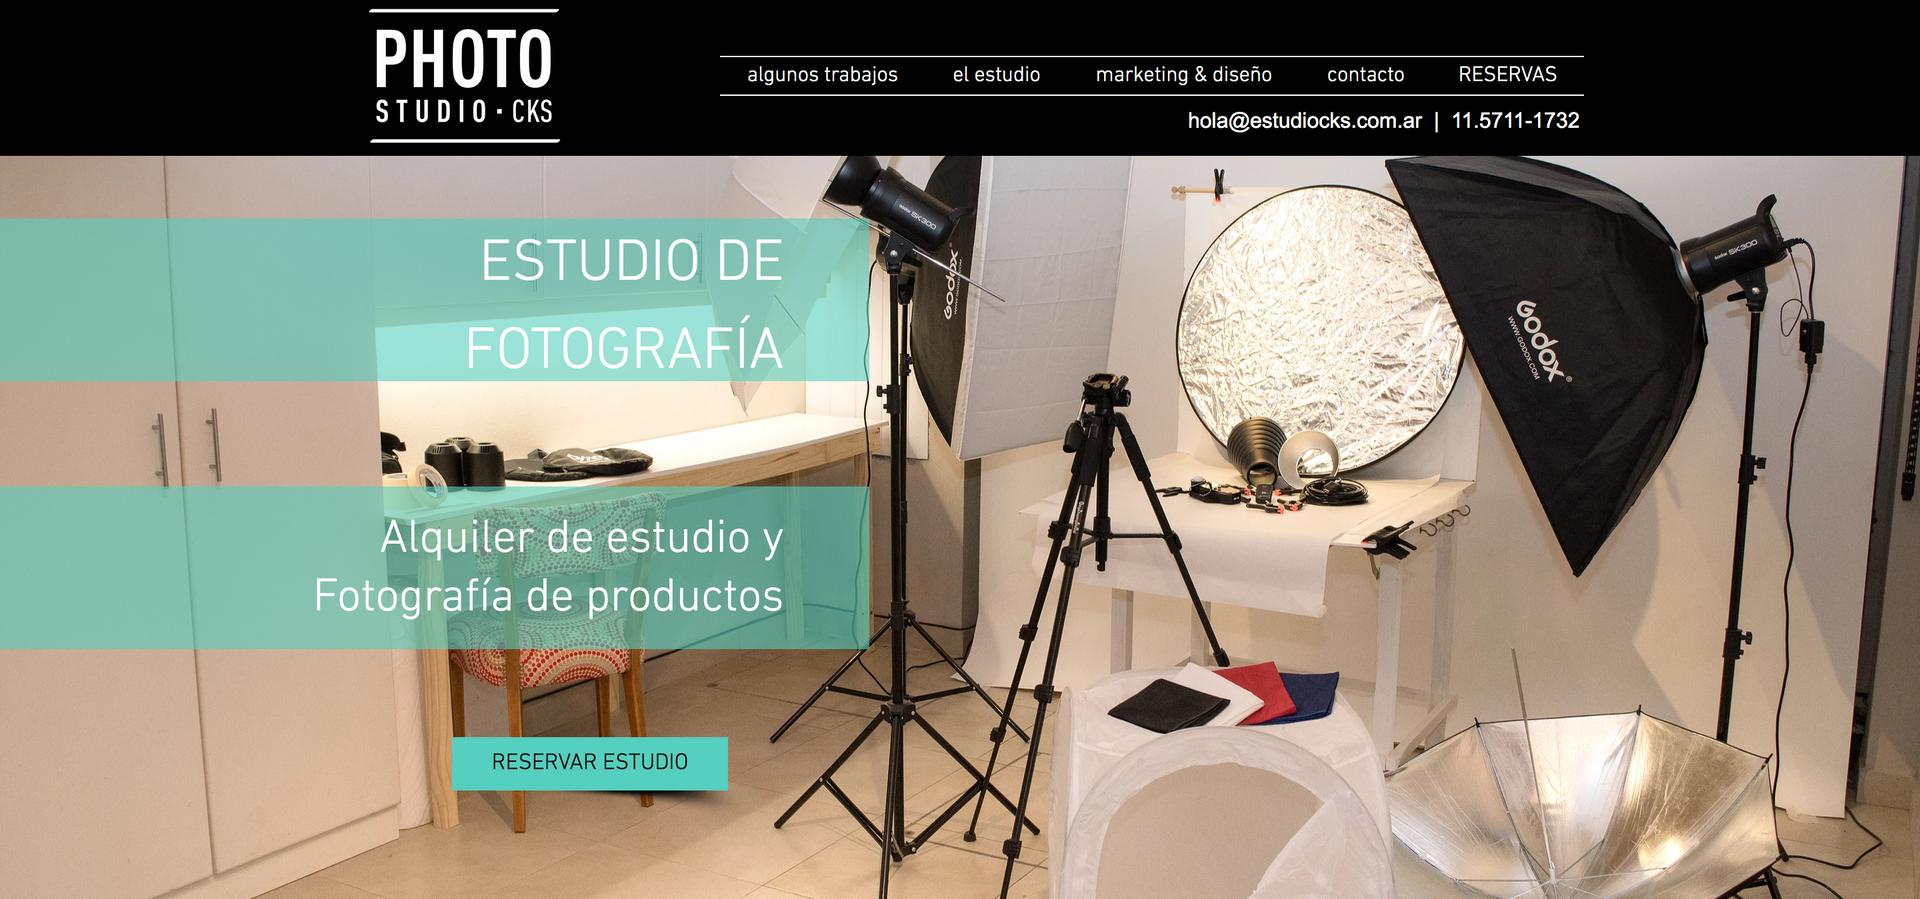 CKS Photo Studio - Ecommerce